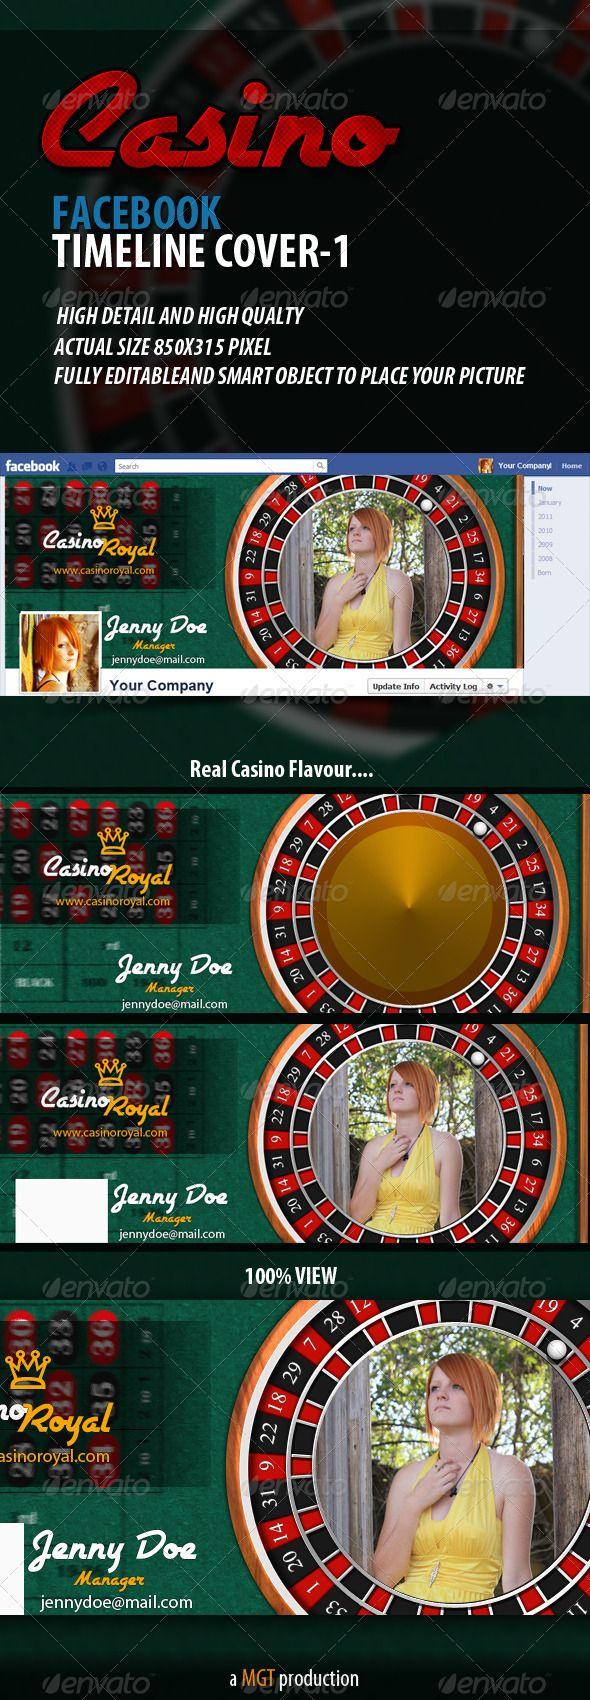 Casino Facebook Timeline Cover - 1